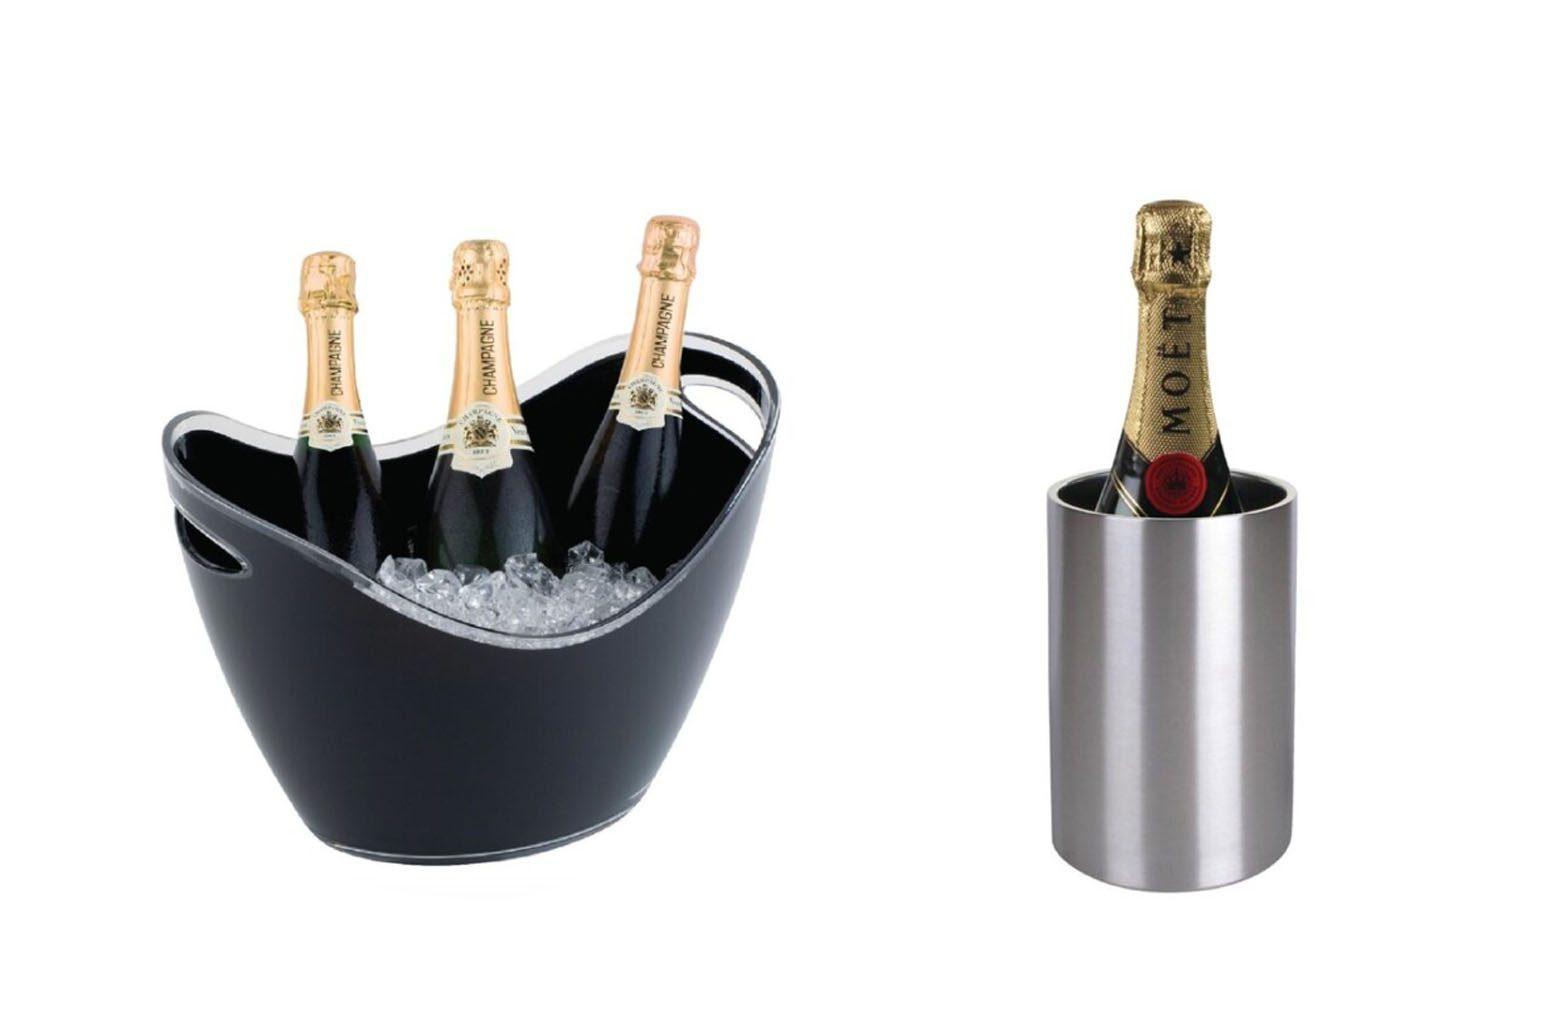 Champagne- & wijnkoelers